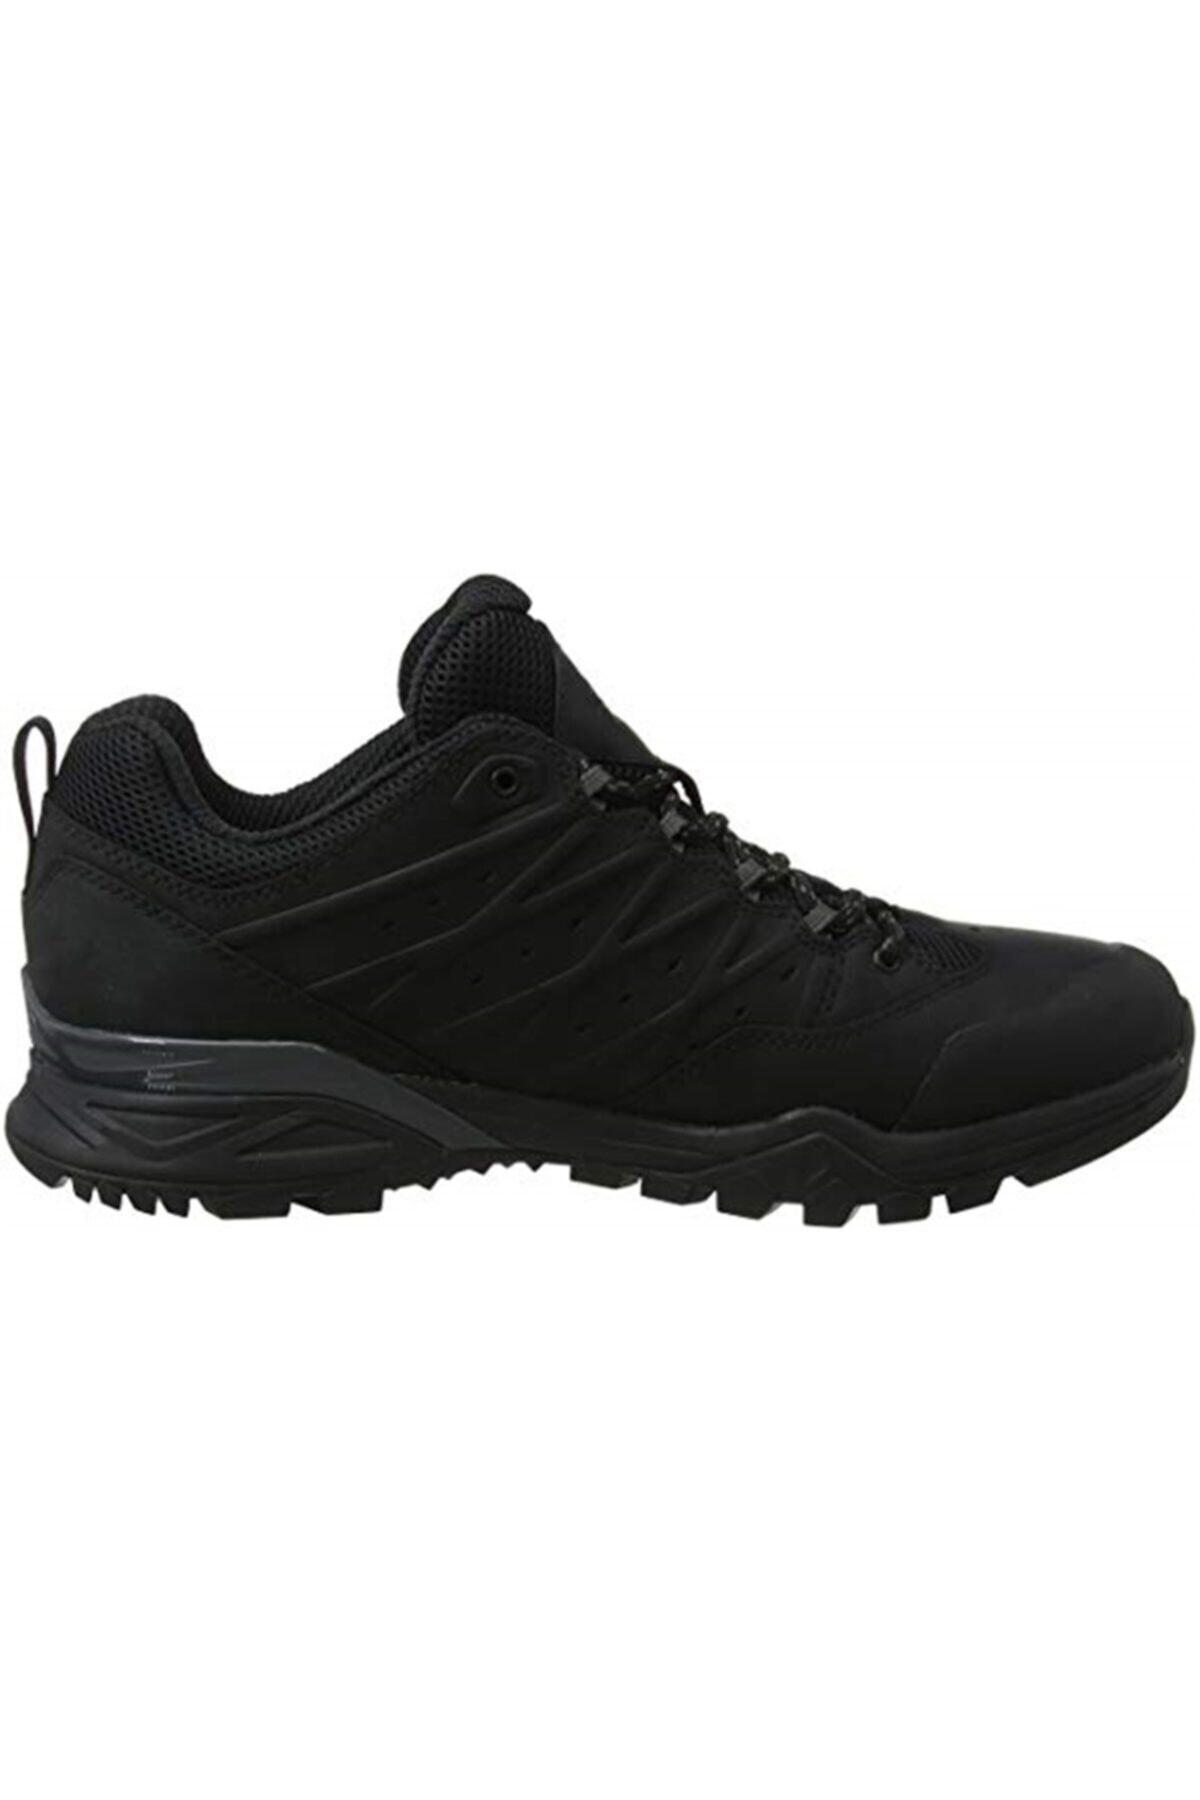 THE NORTH FACE Tnf M Hh Hike Gtx Iı Siyah Gri Erkek Ayakkabı 2